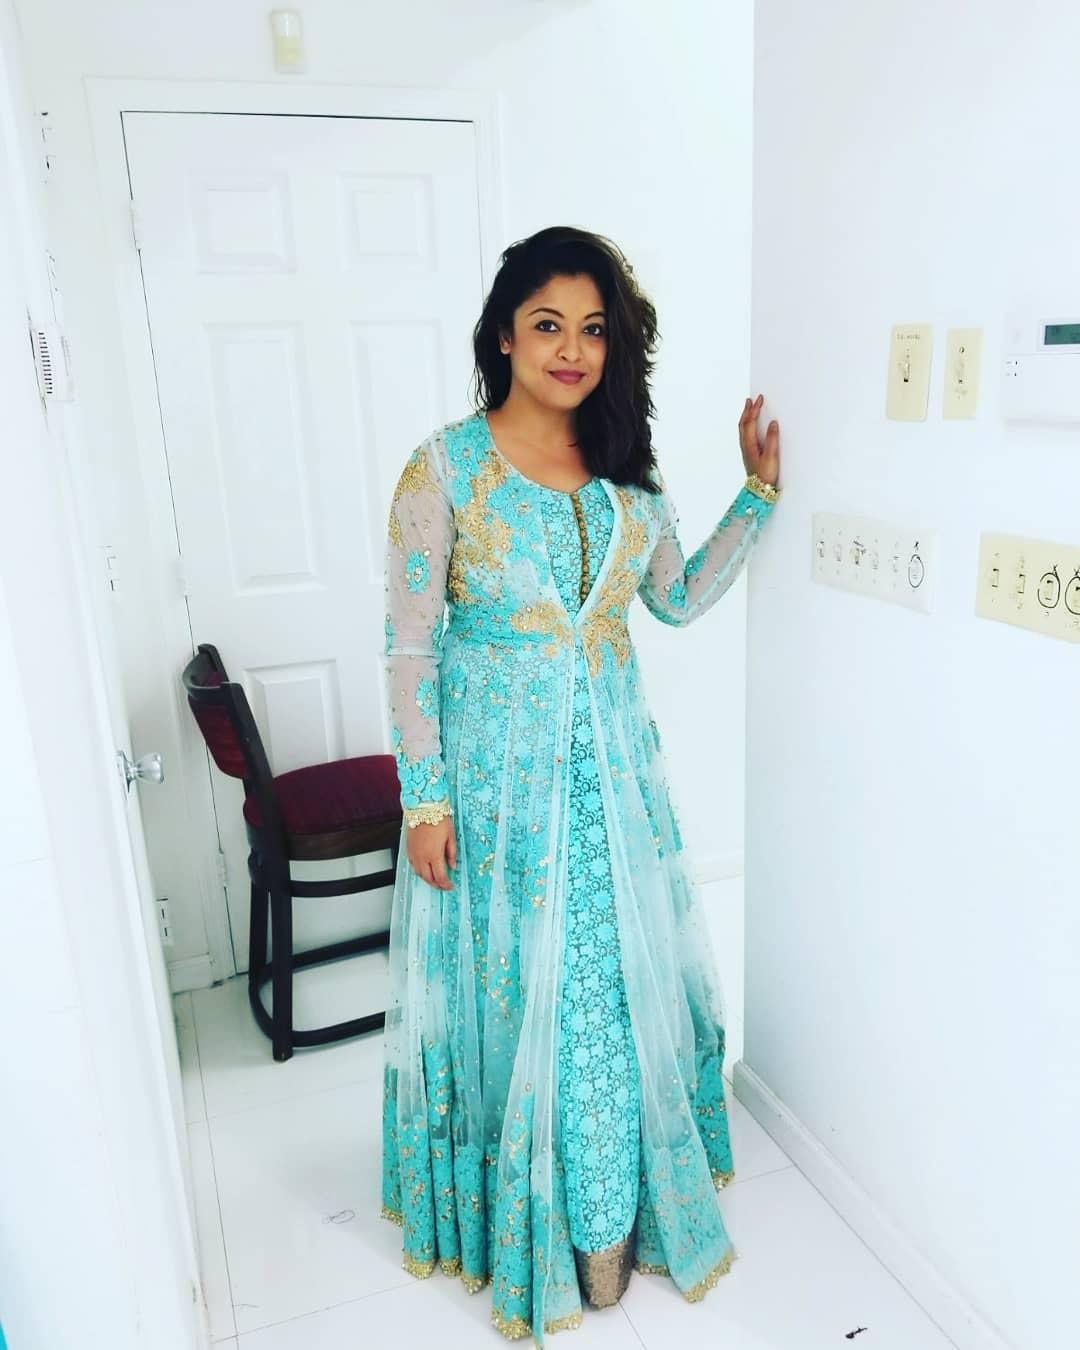 Tanushree Dutta New Photos 2019 Instagram